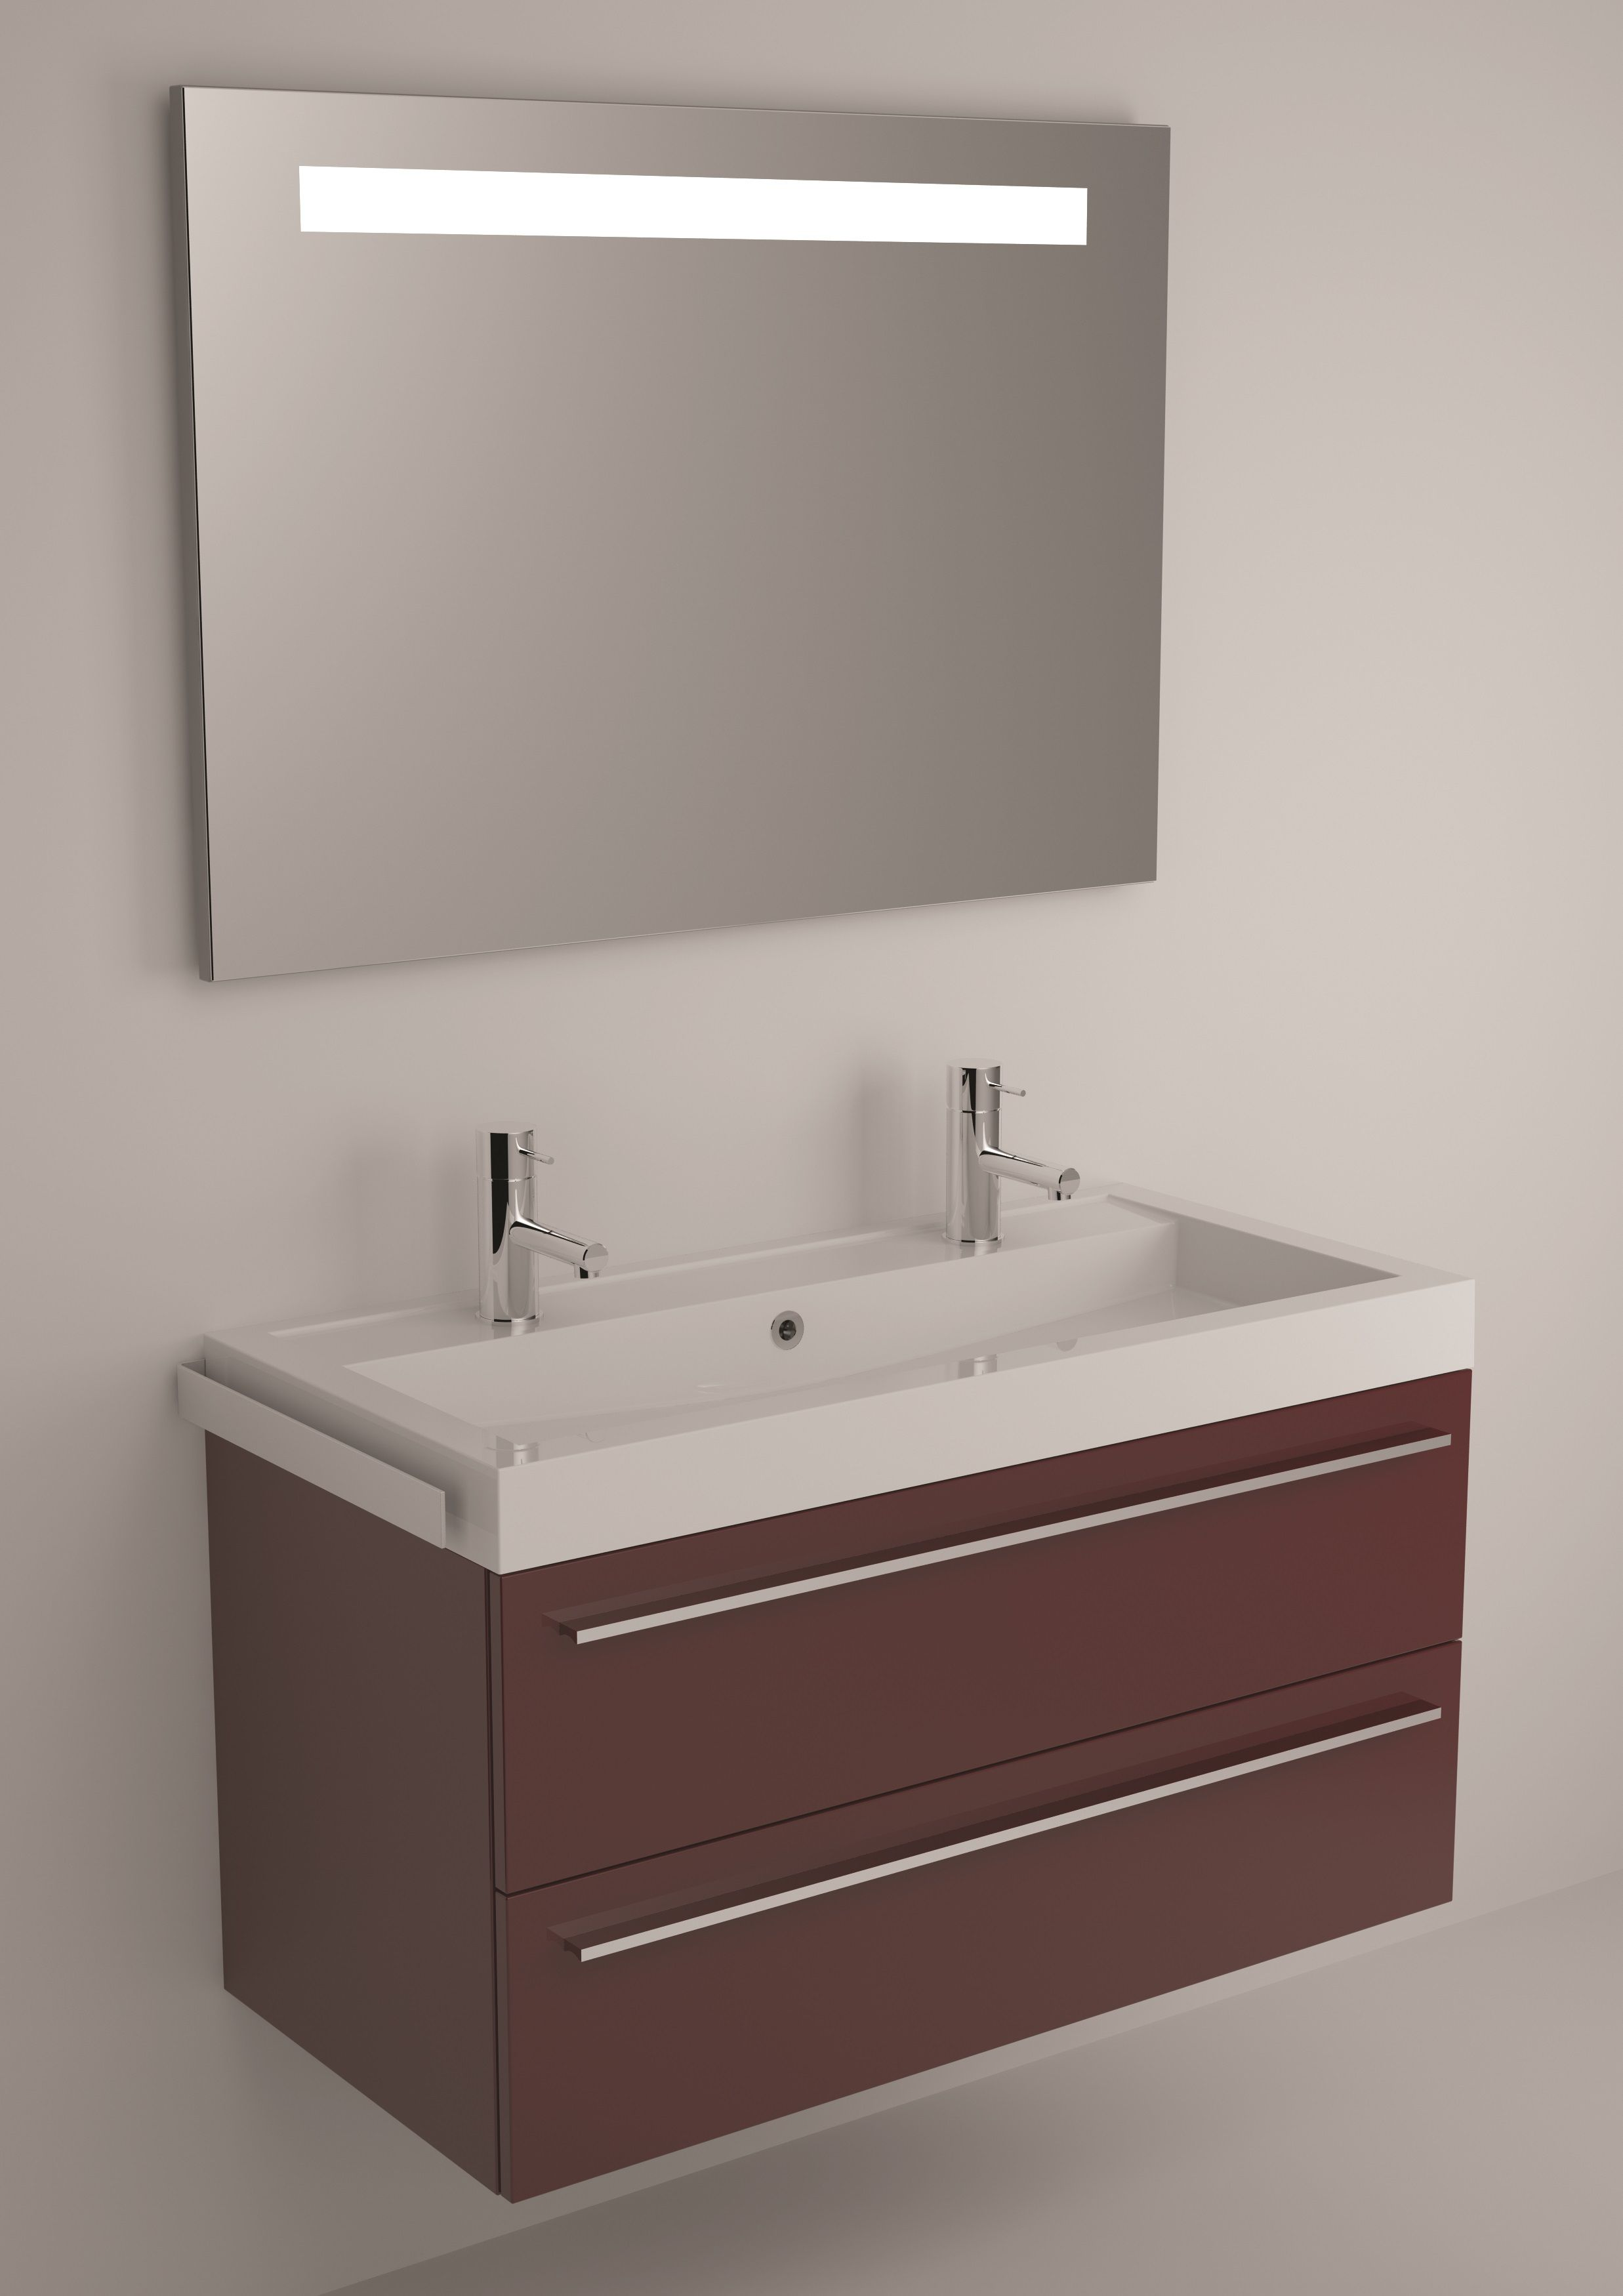 meuble 2 vasques 100 cm | Coiffure | Pinterest | Vasque, Meuble ...